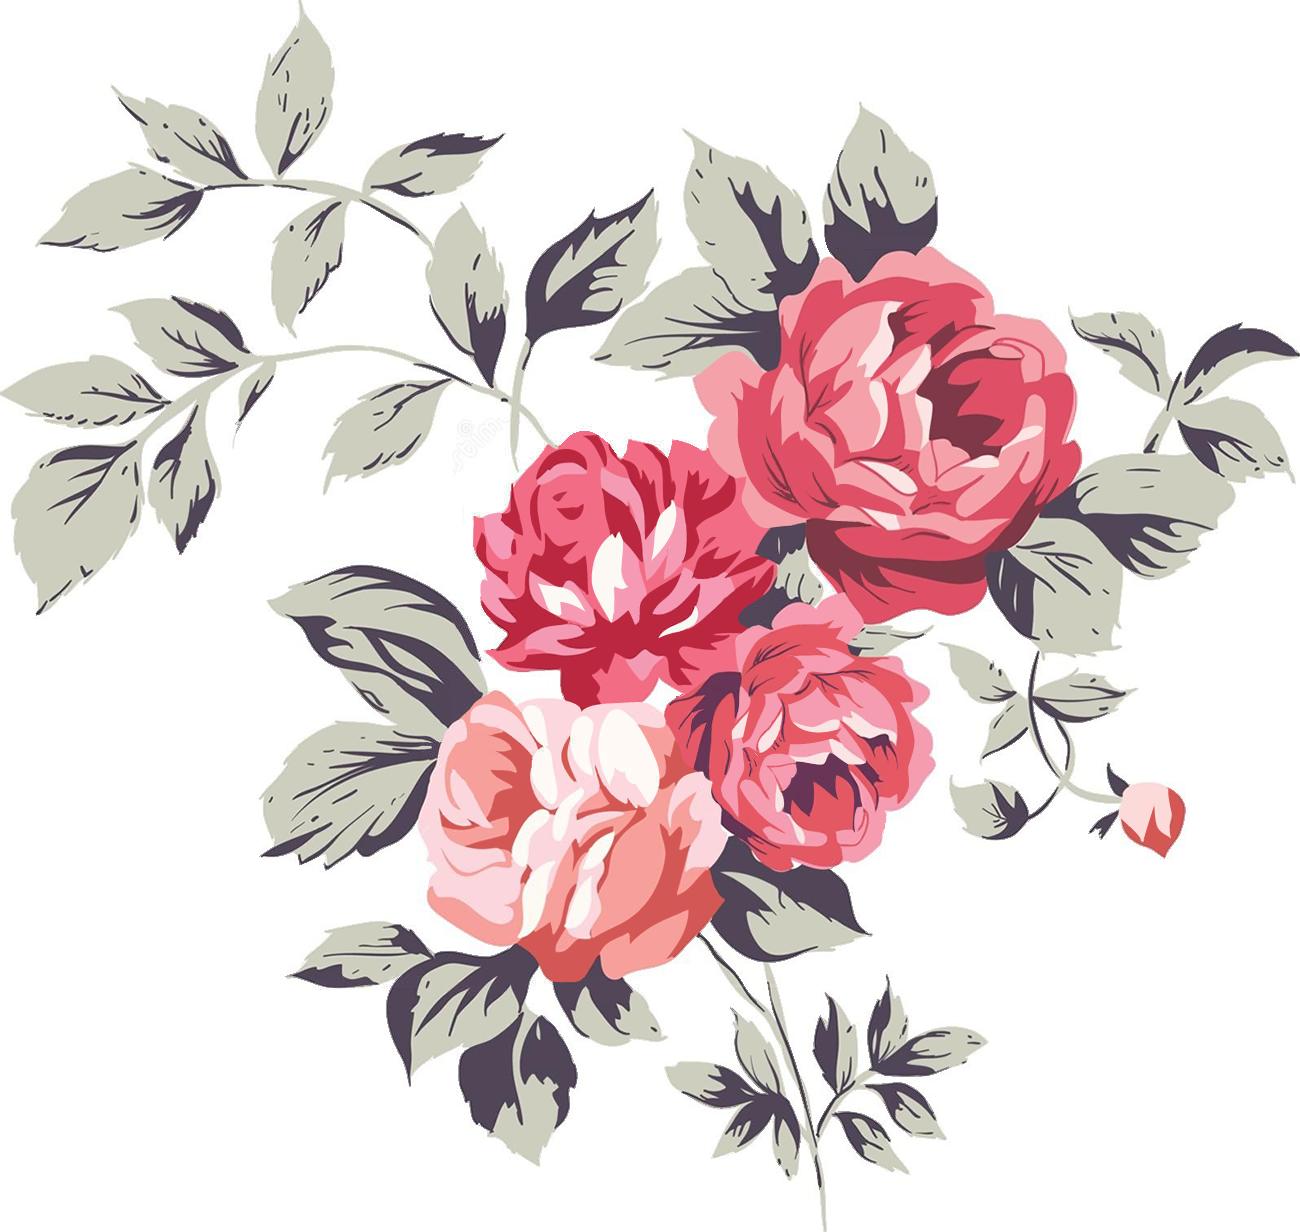 Flower Drawing App: الأزهار On Emaze